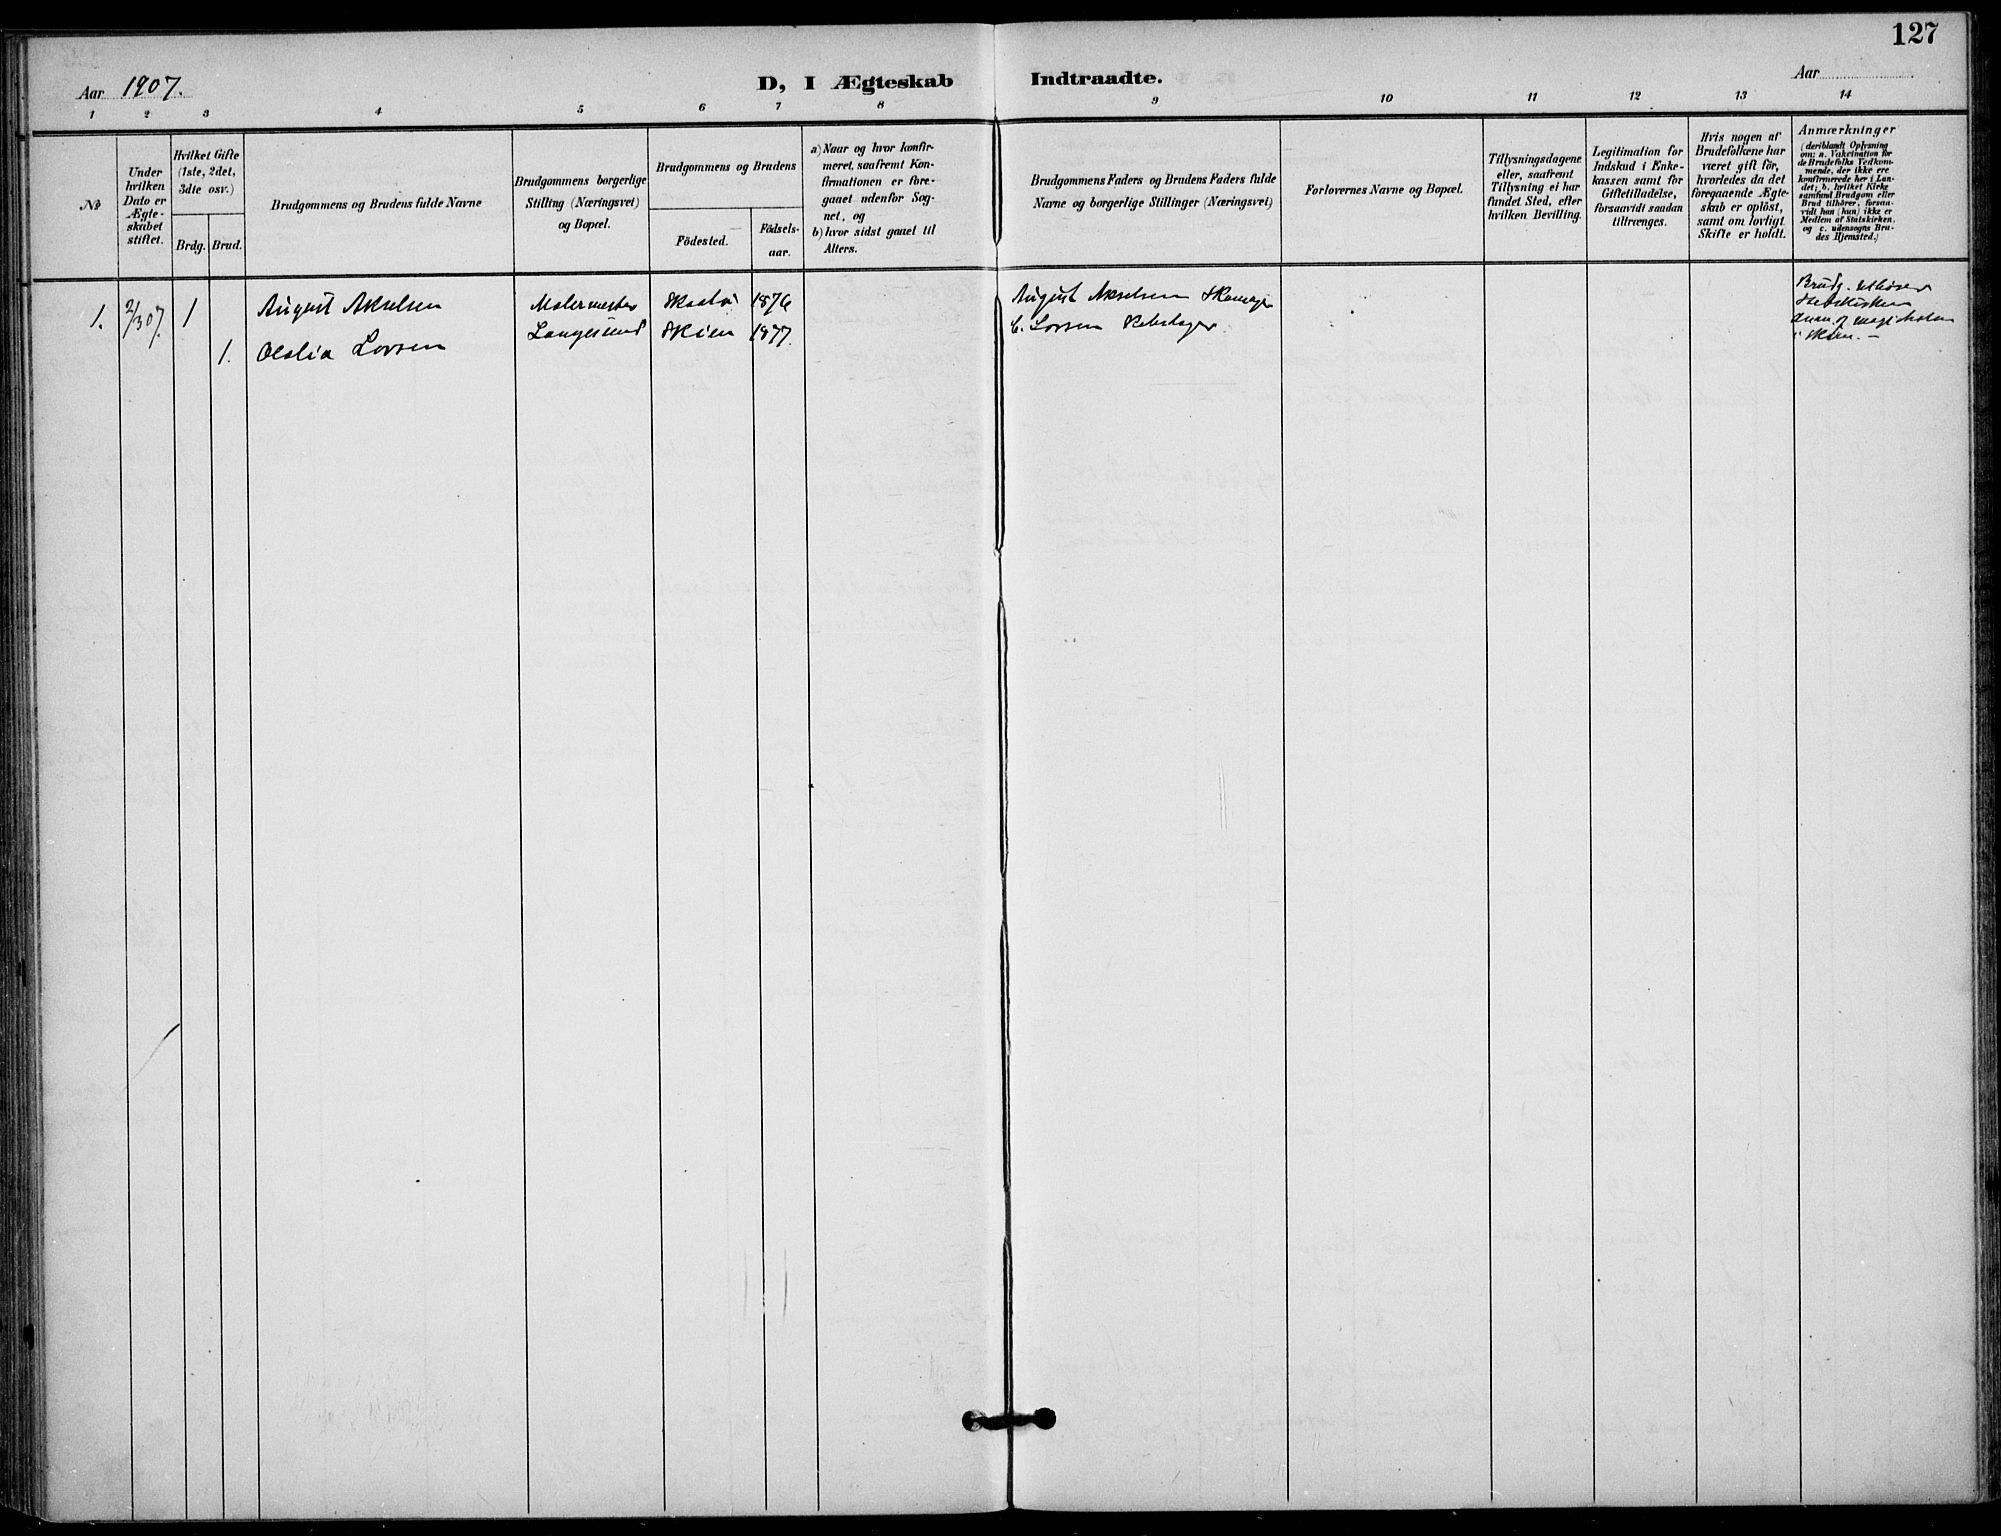 SAKO, Langesund kirkebøker, F/Fa/L0003: Ministerialbok nr. 3, 1893-1907, s. 127